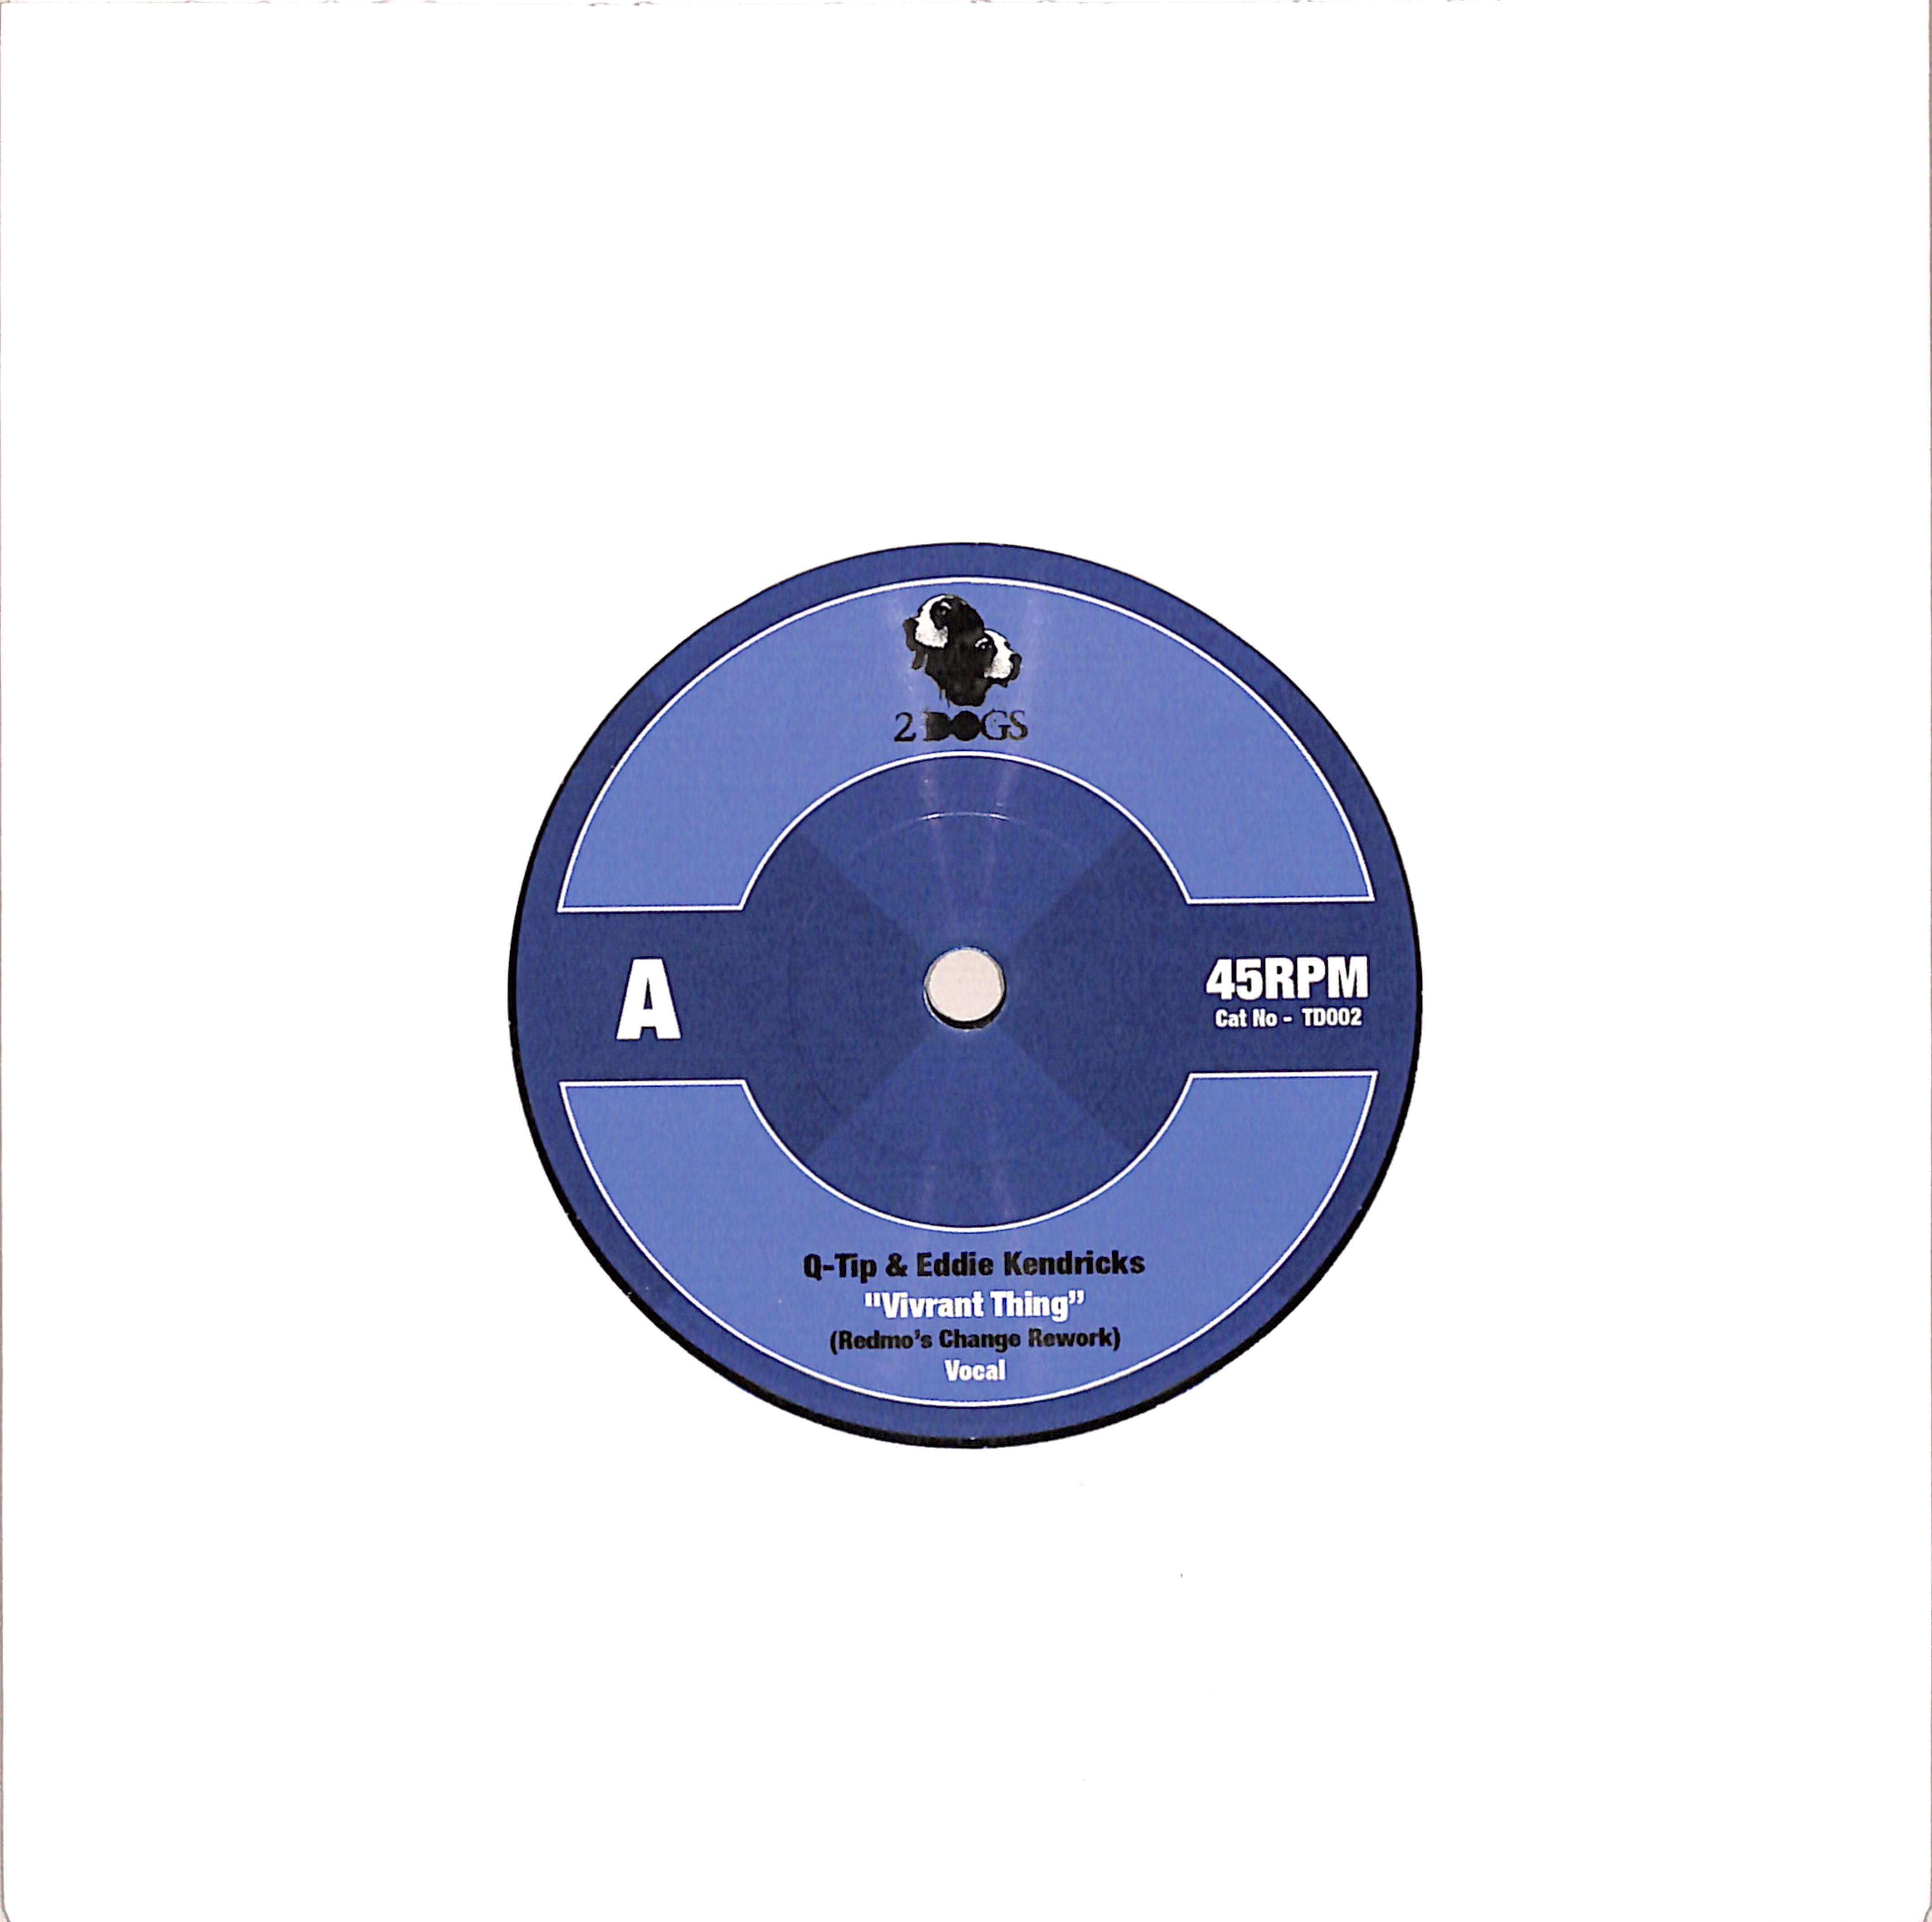 Q-Tip & Eddie Kendricks - VIVRANT THING REDMOS CHANGE REWORK